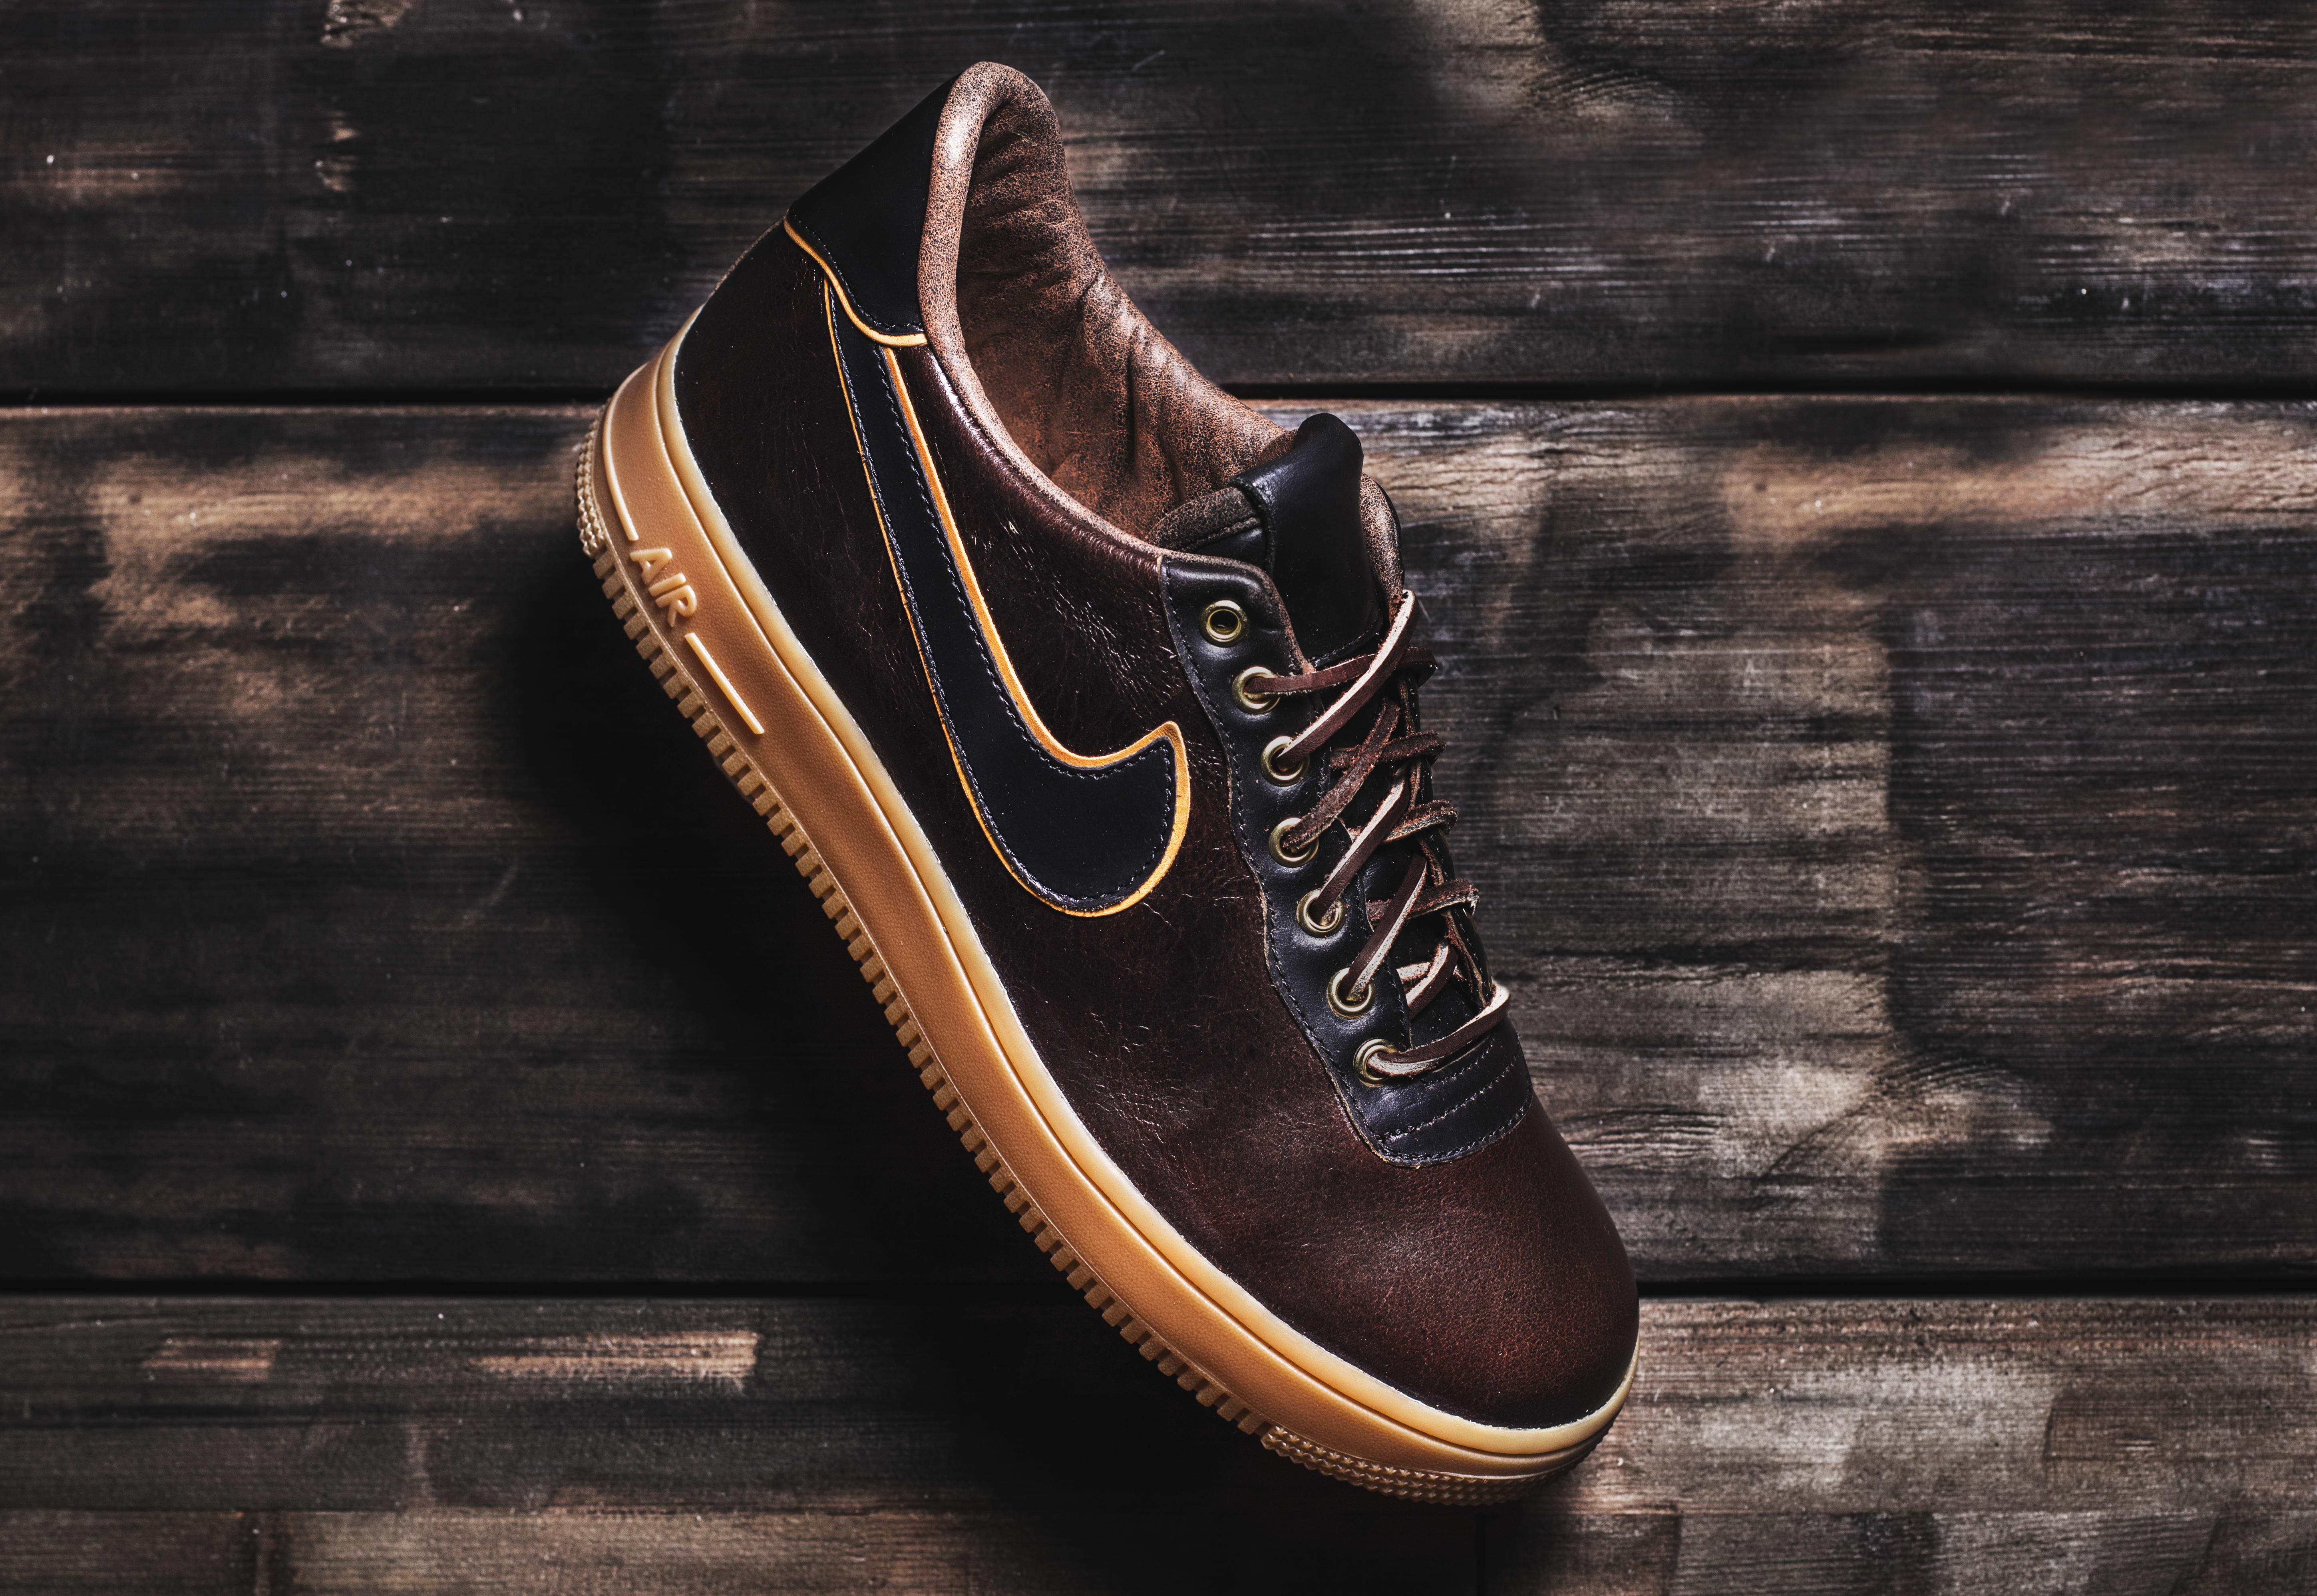 Jack Daniels x The Shoe Surgeon x Nike Air Force 1 3